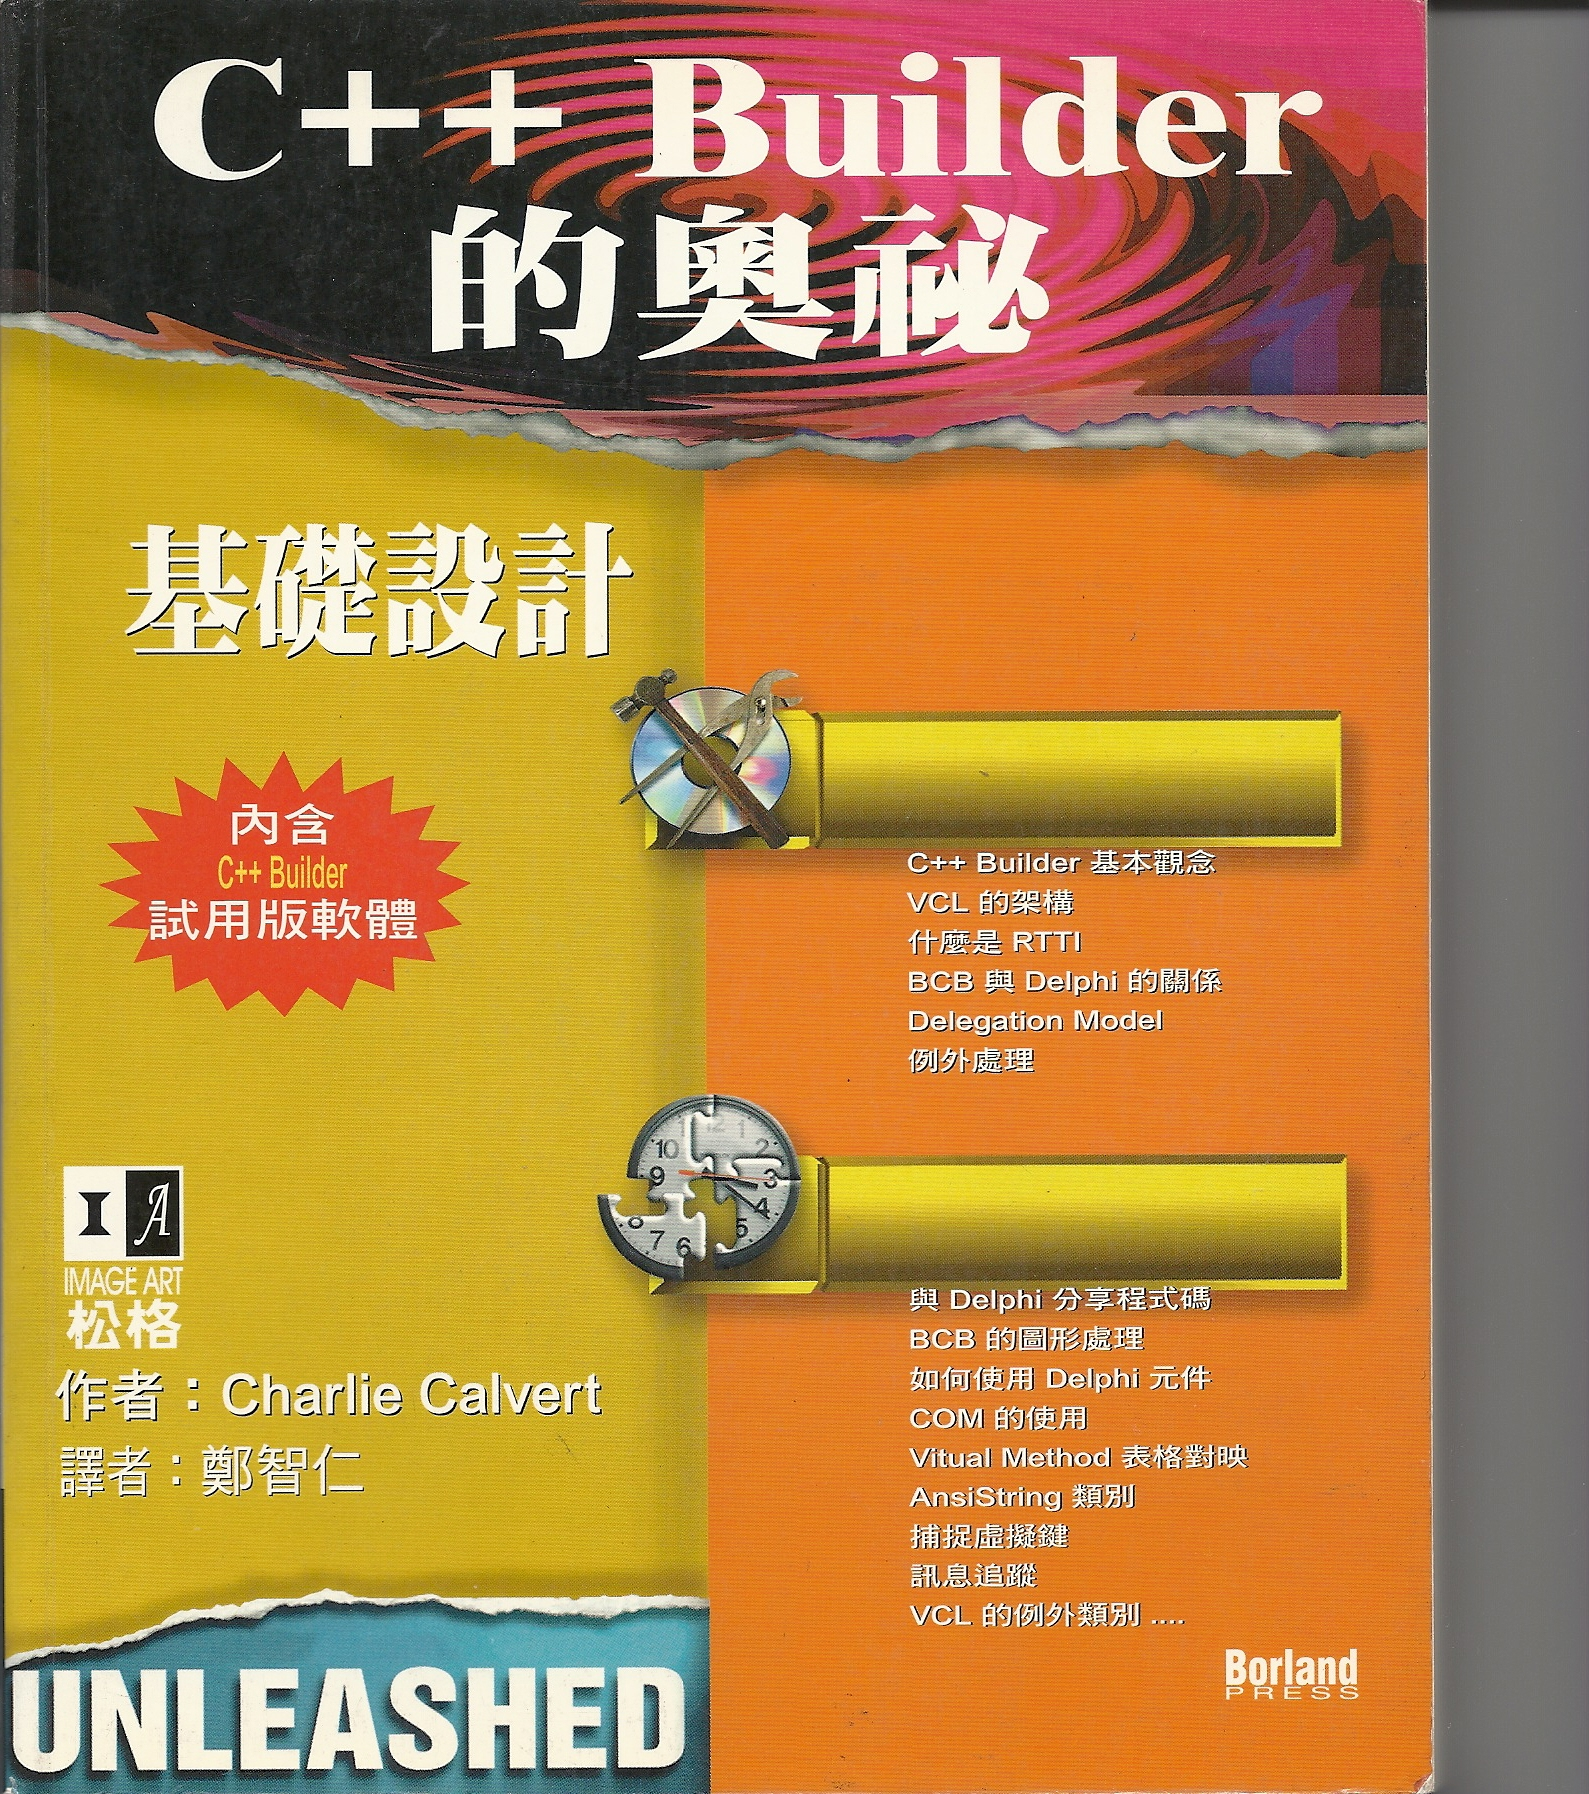 C++ Builder 的奧秘